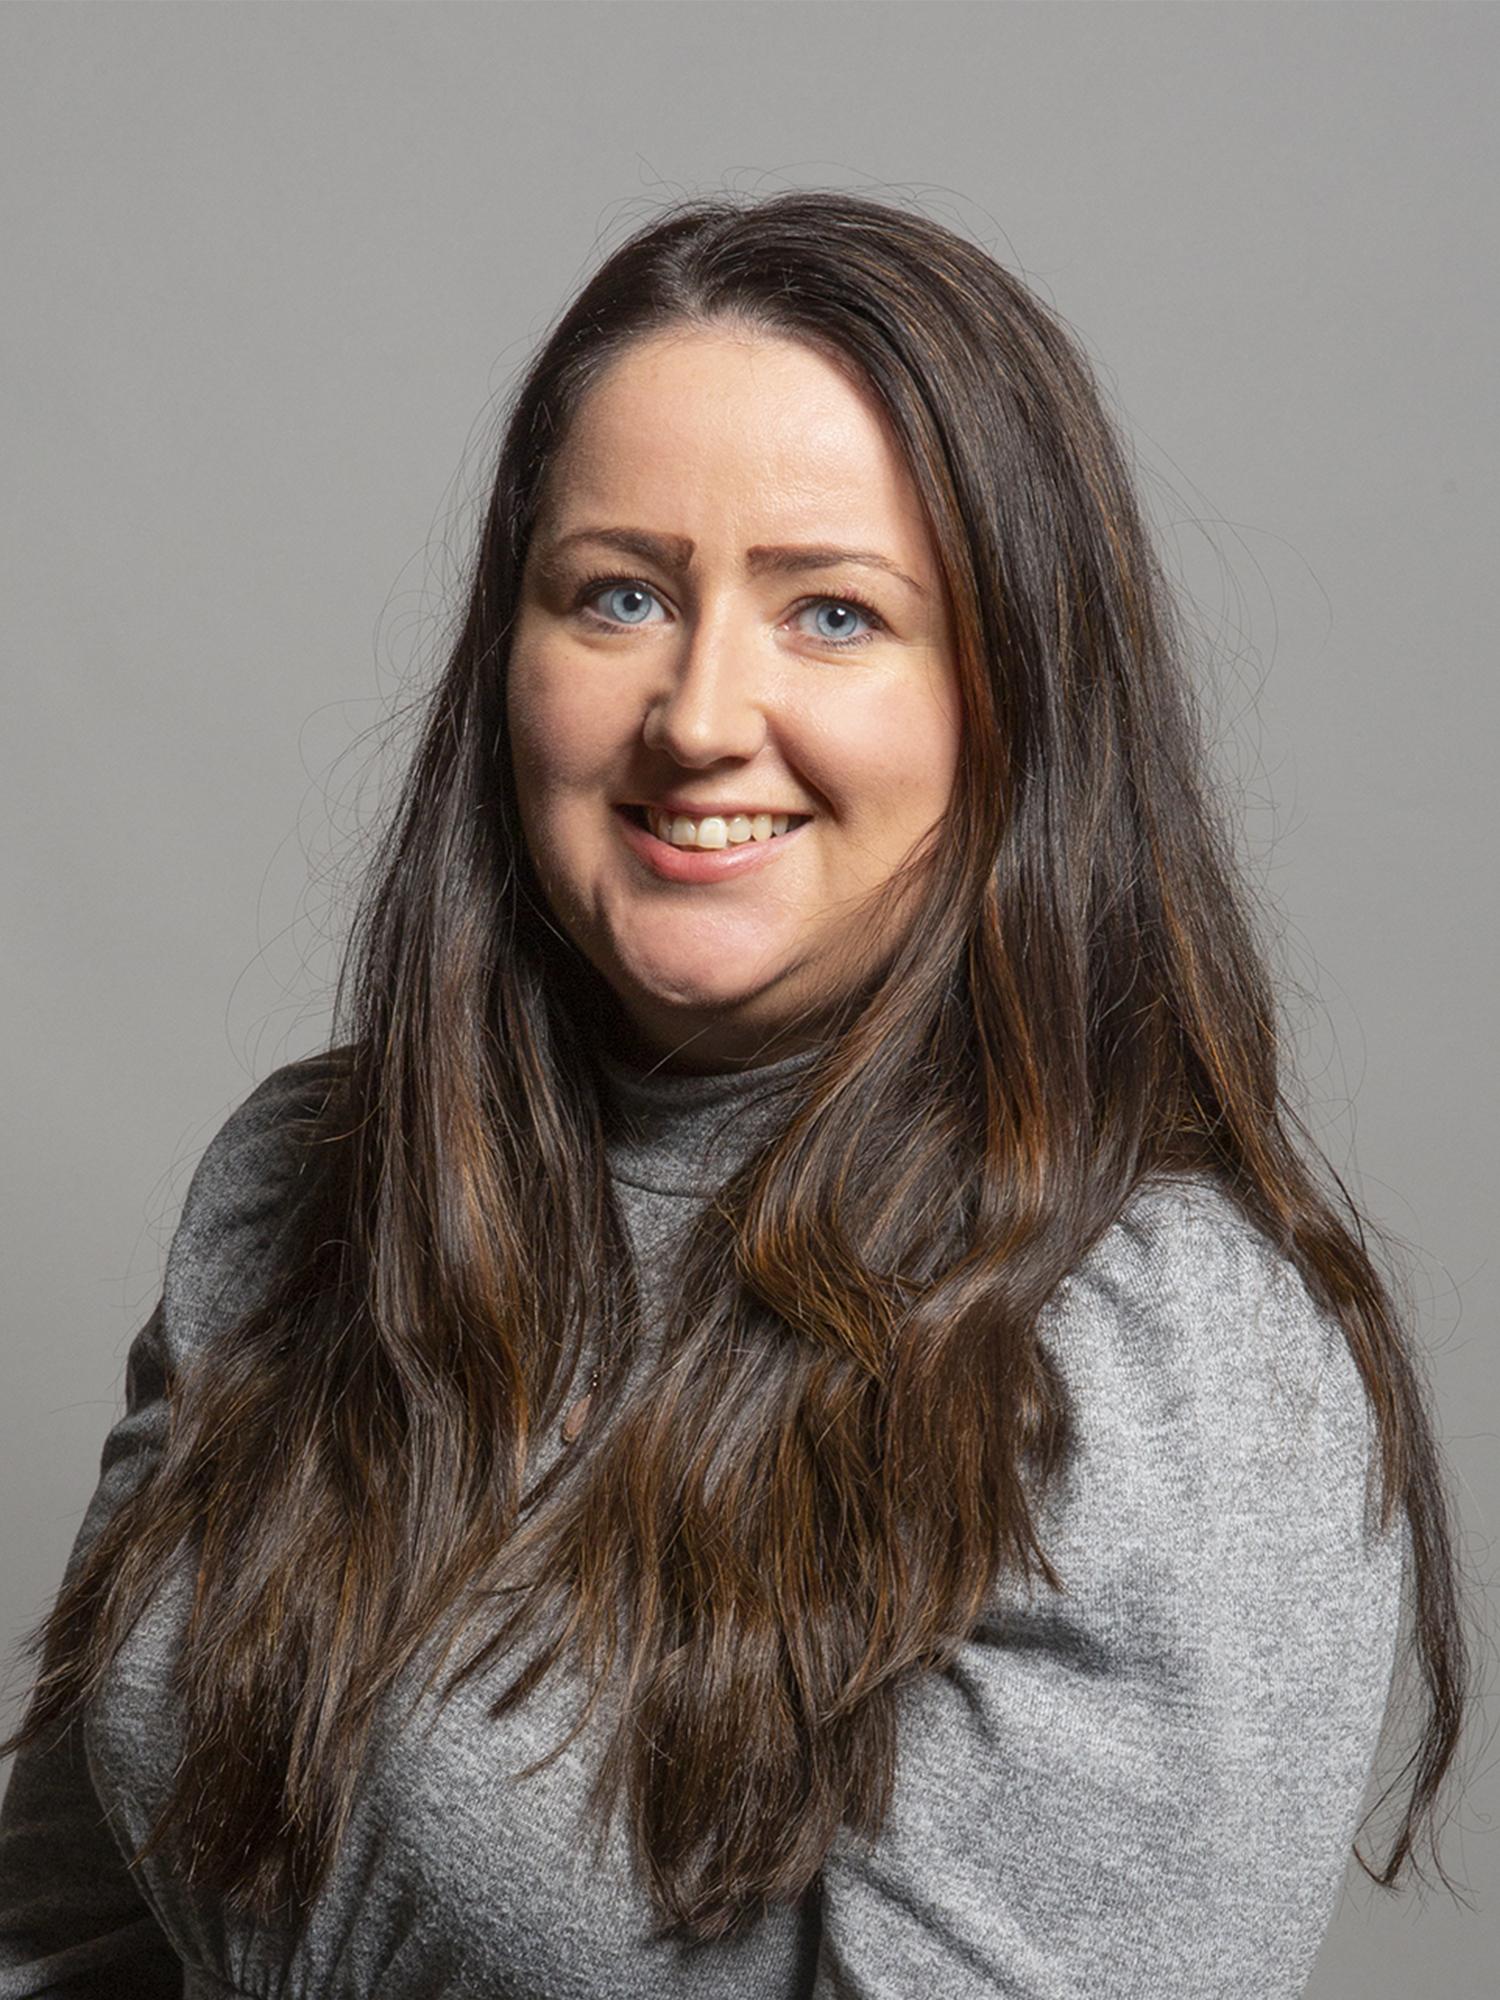 Angela Crawley - Wikipedia